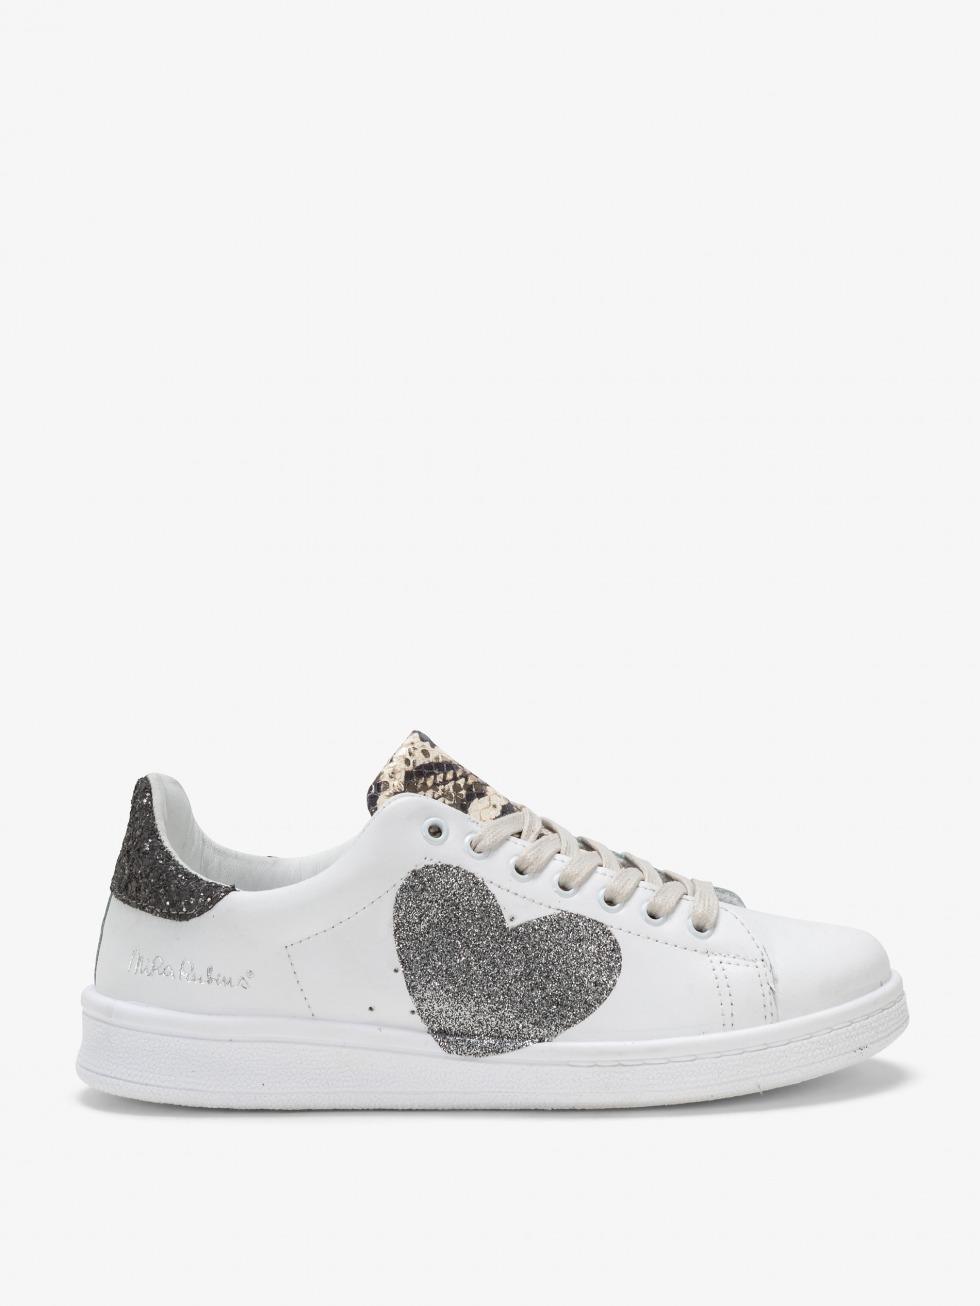 Sneakers Daiquiri Cool White - Cuore